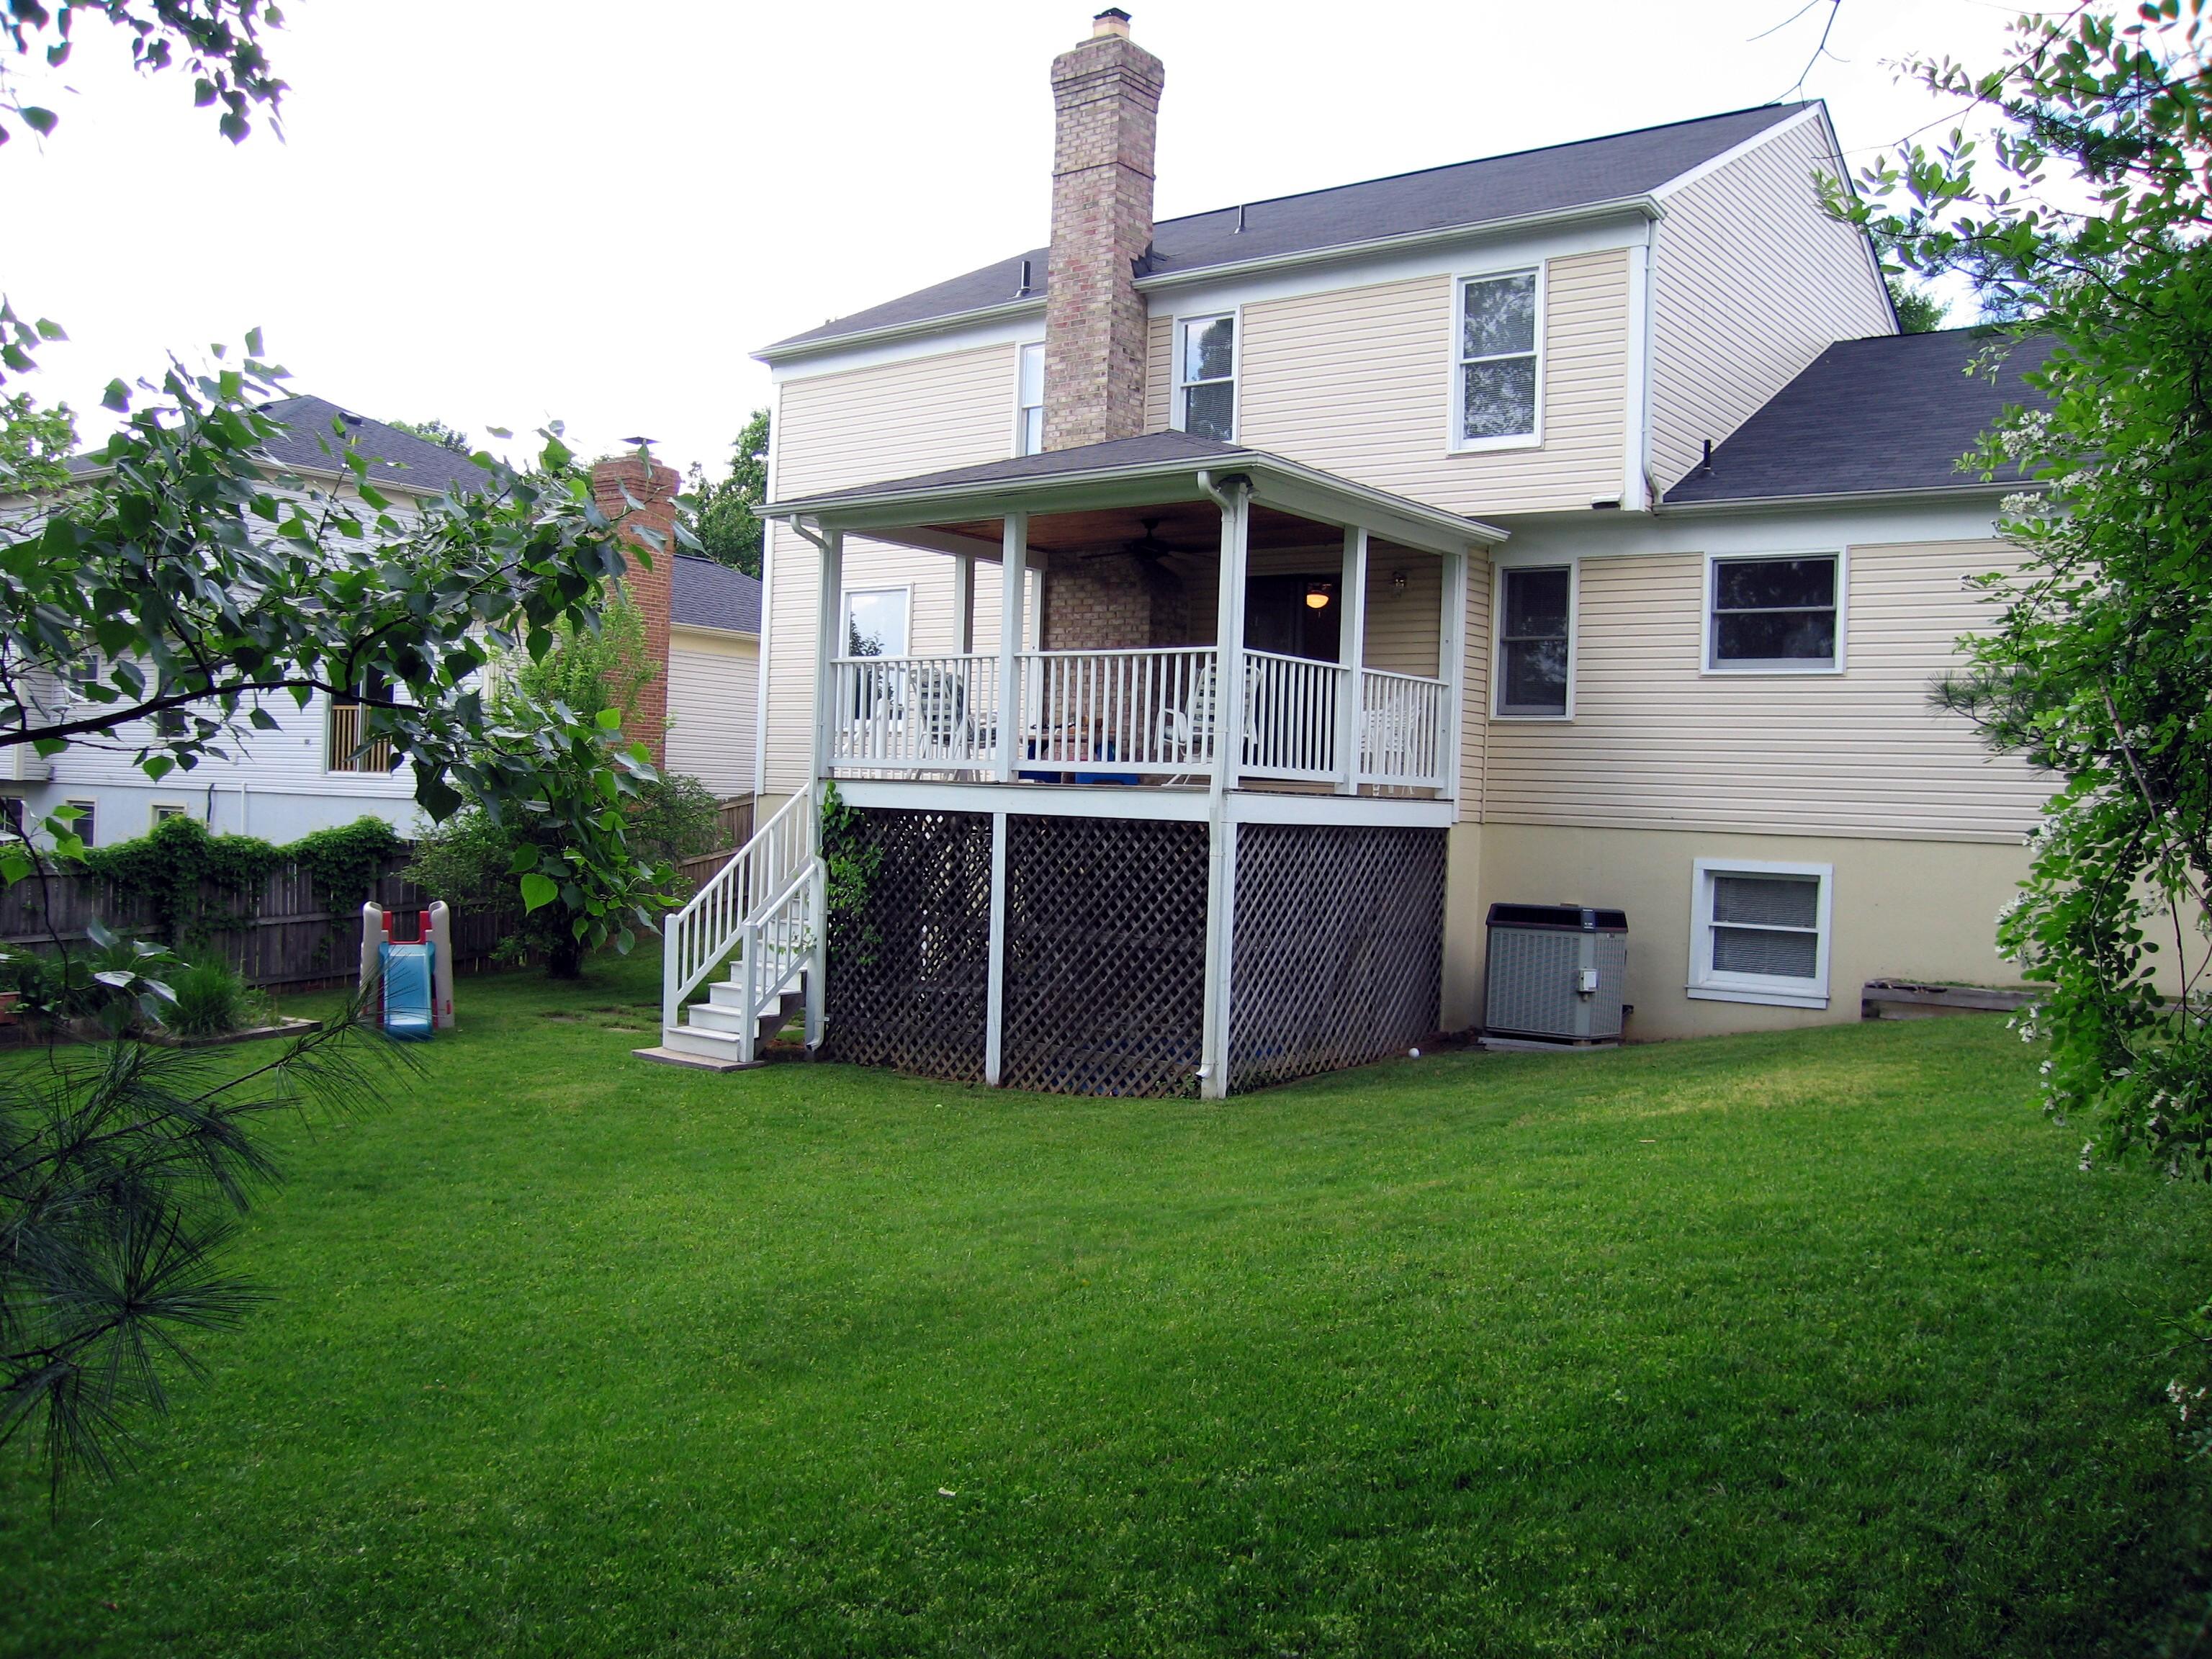 house backyard photo - 2